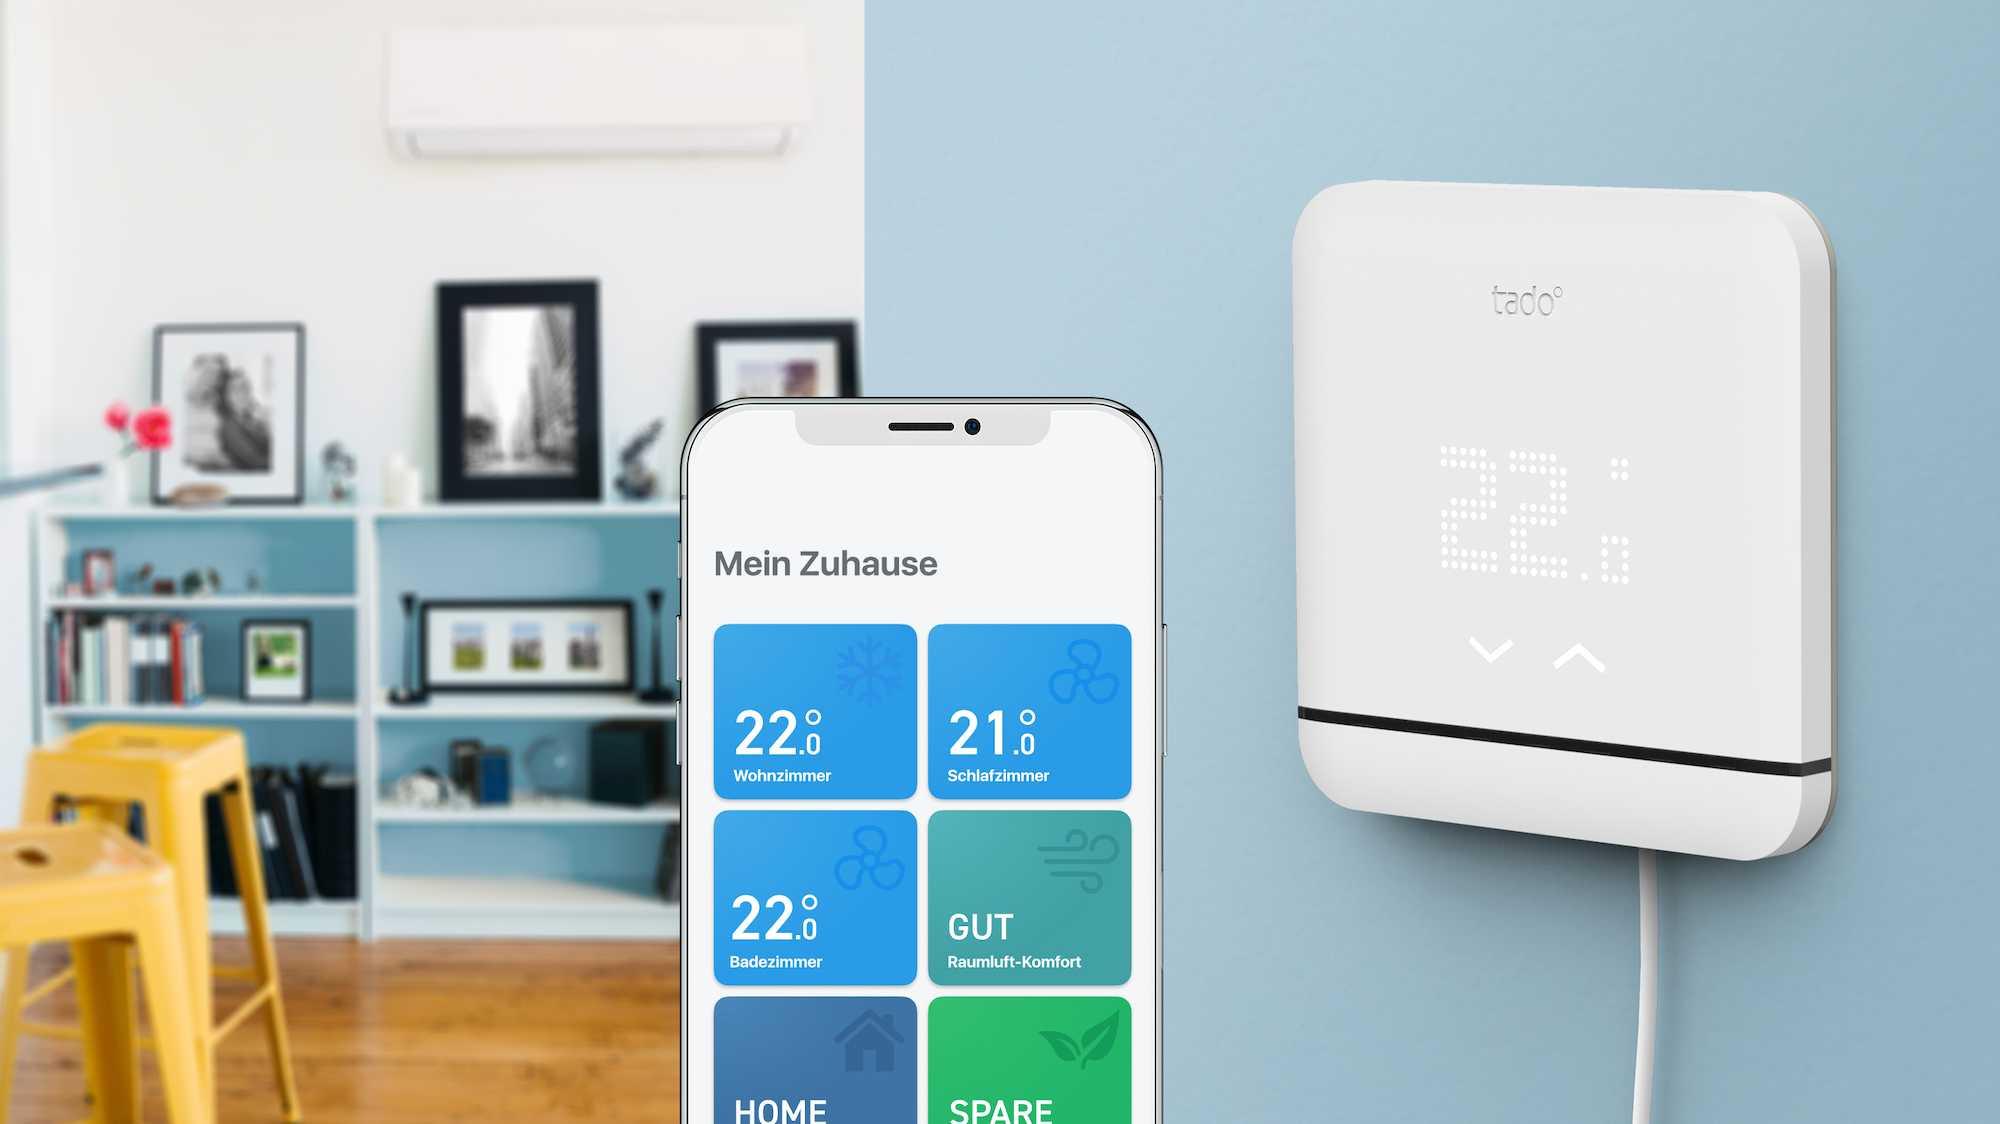 Tado vernetzt Klimaanlagen mit Apples HomeKit